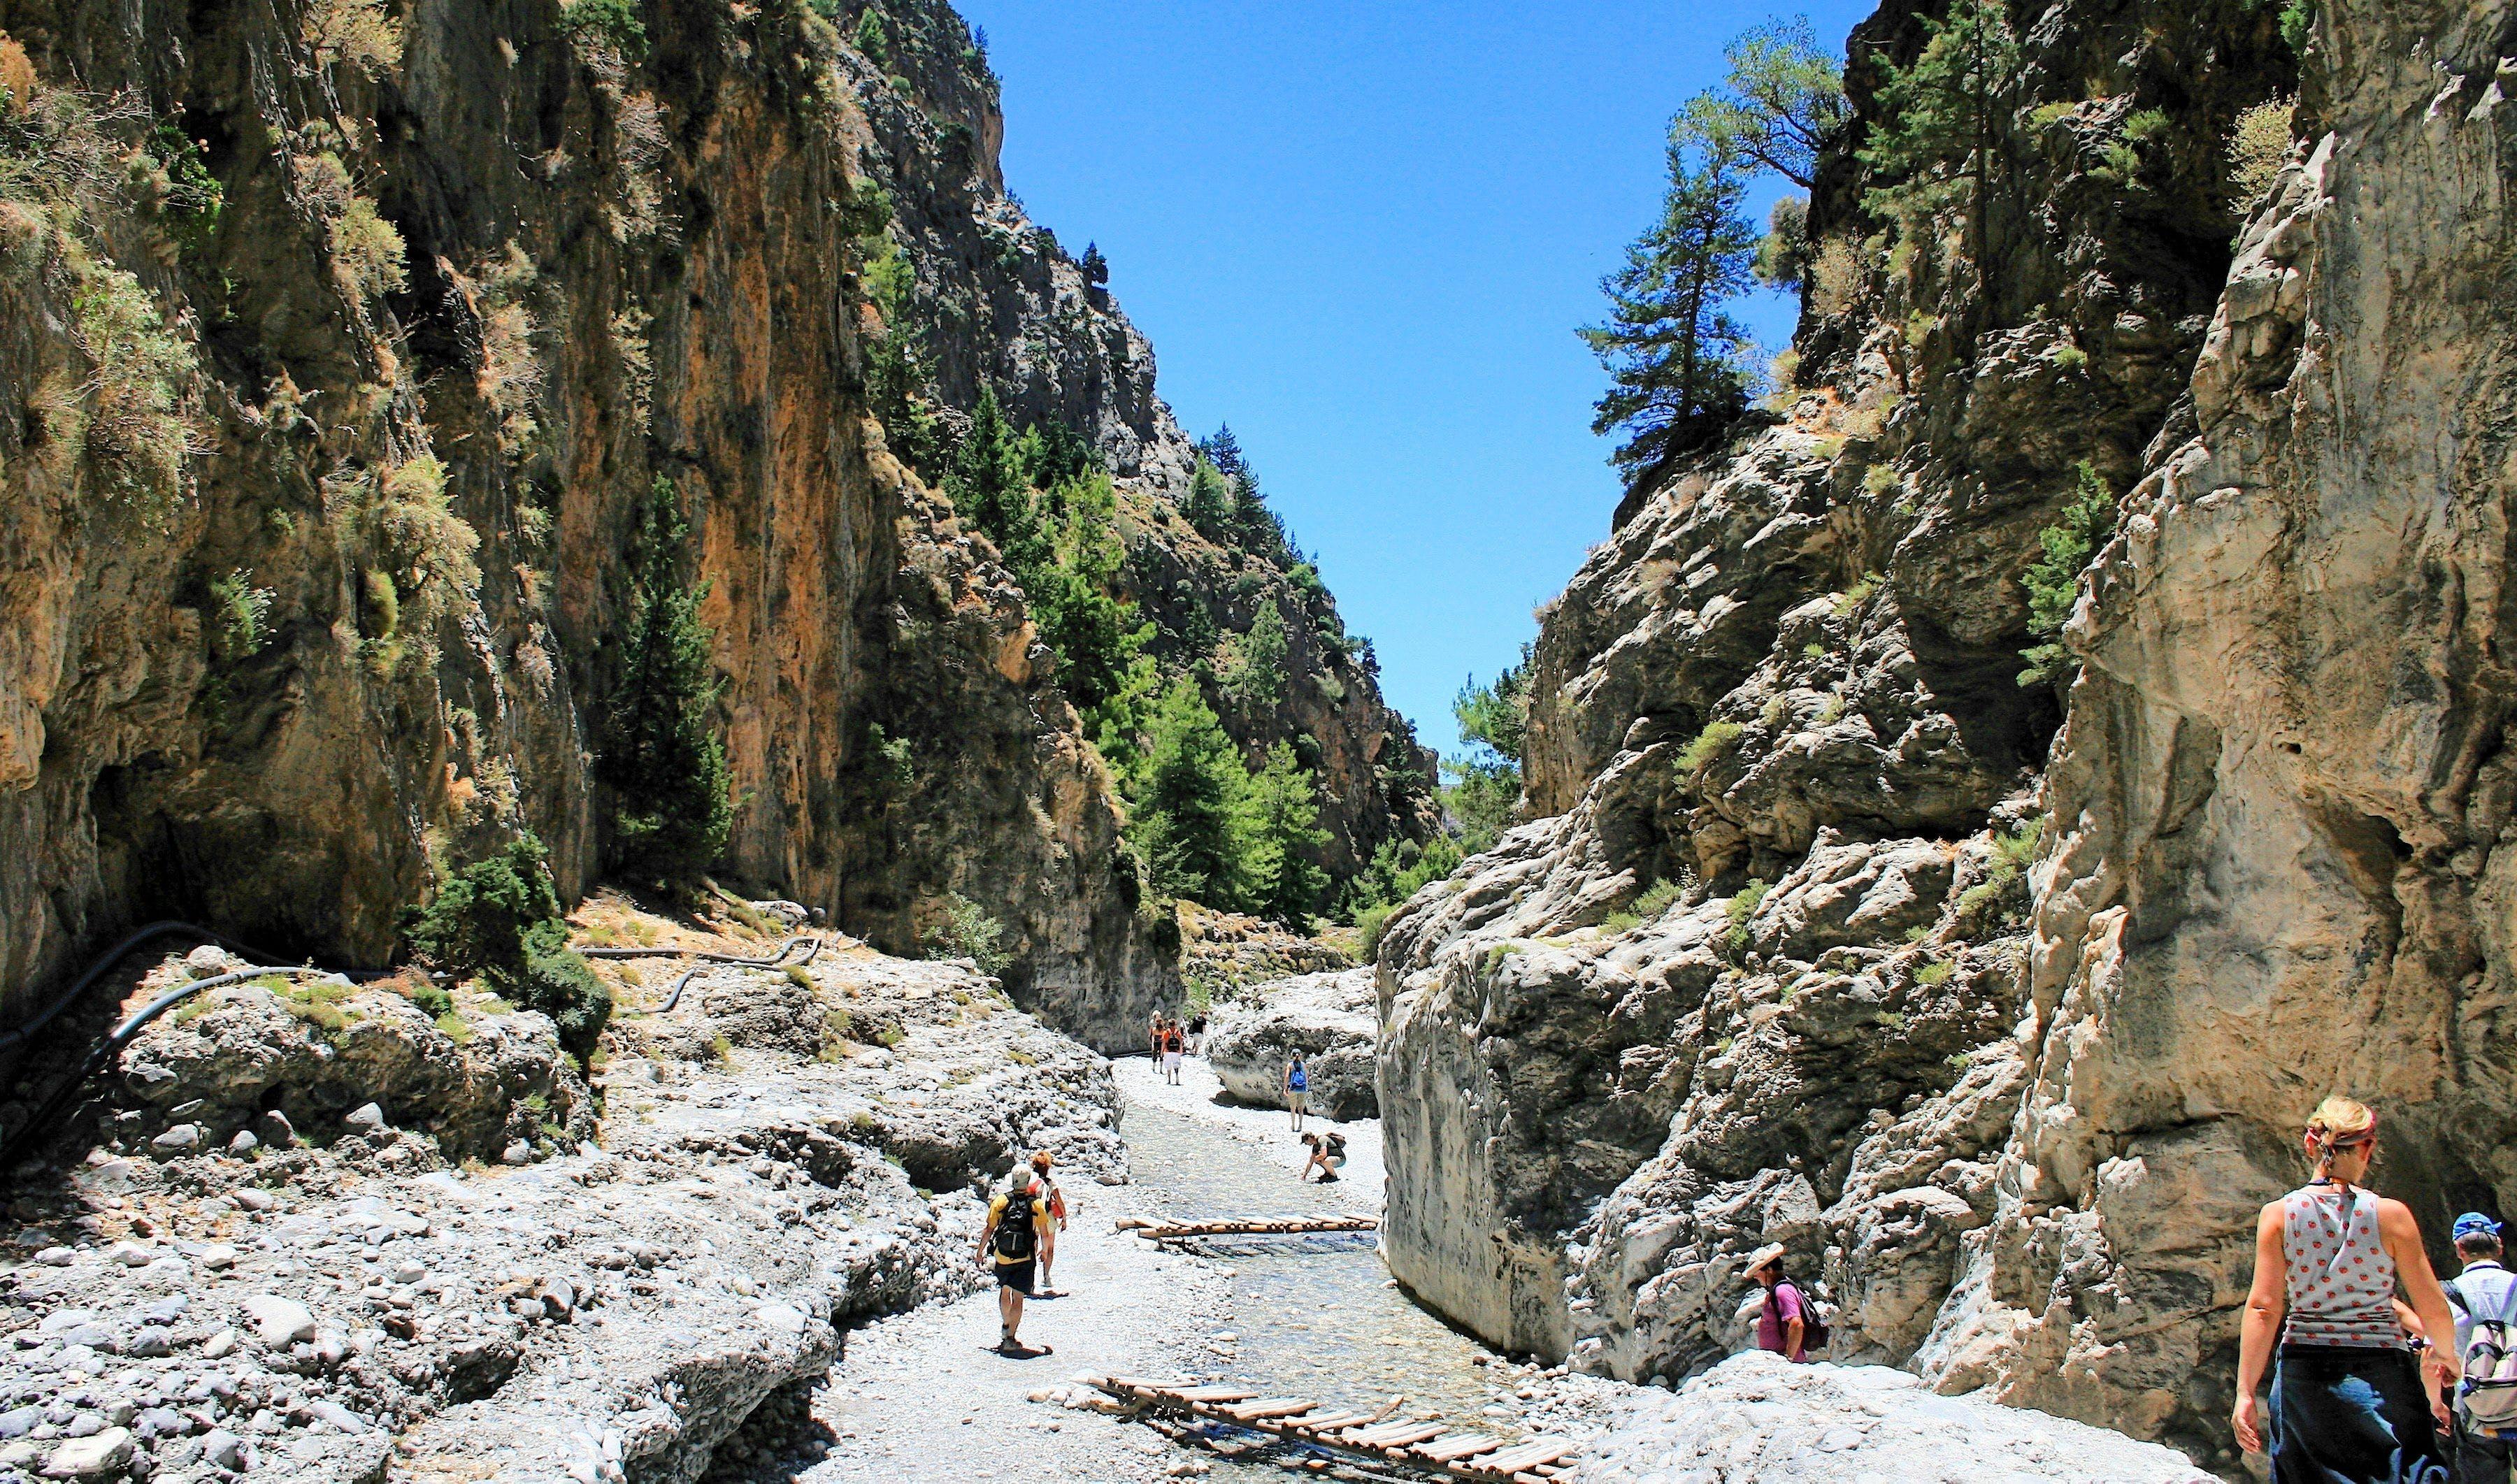 Samaria-Schlucht, Kreta   griechenland.de